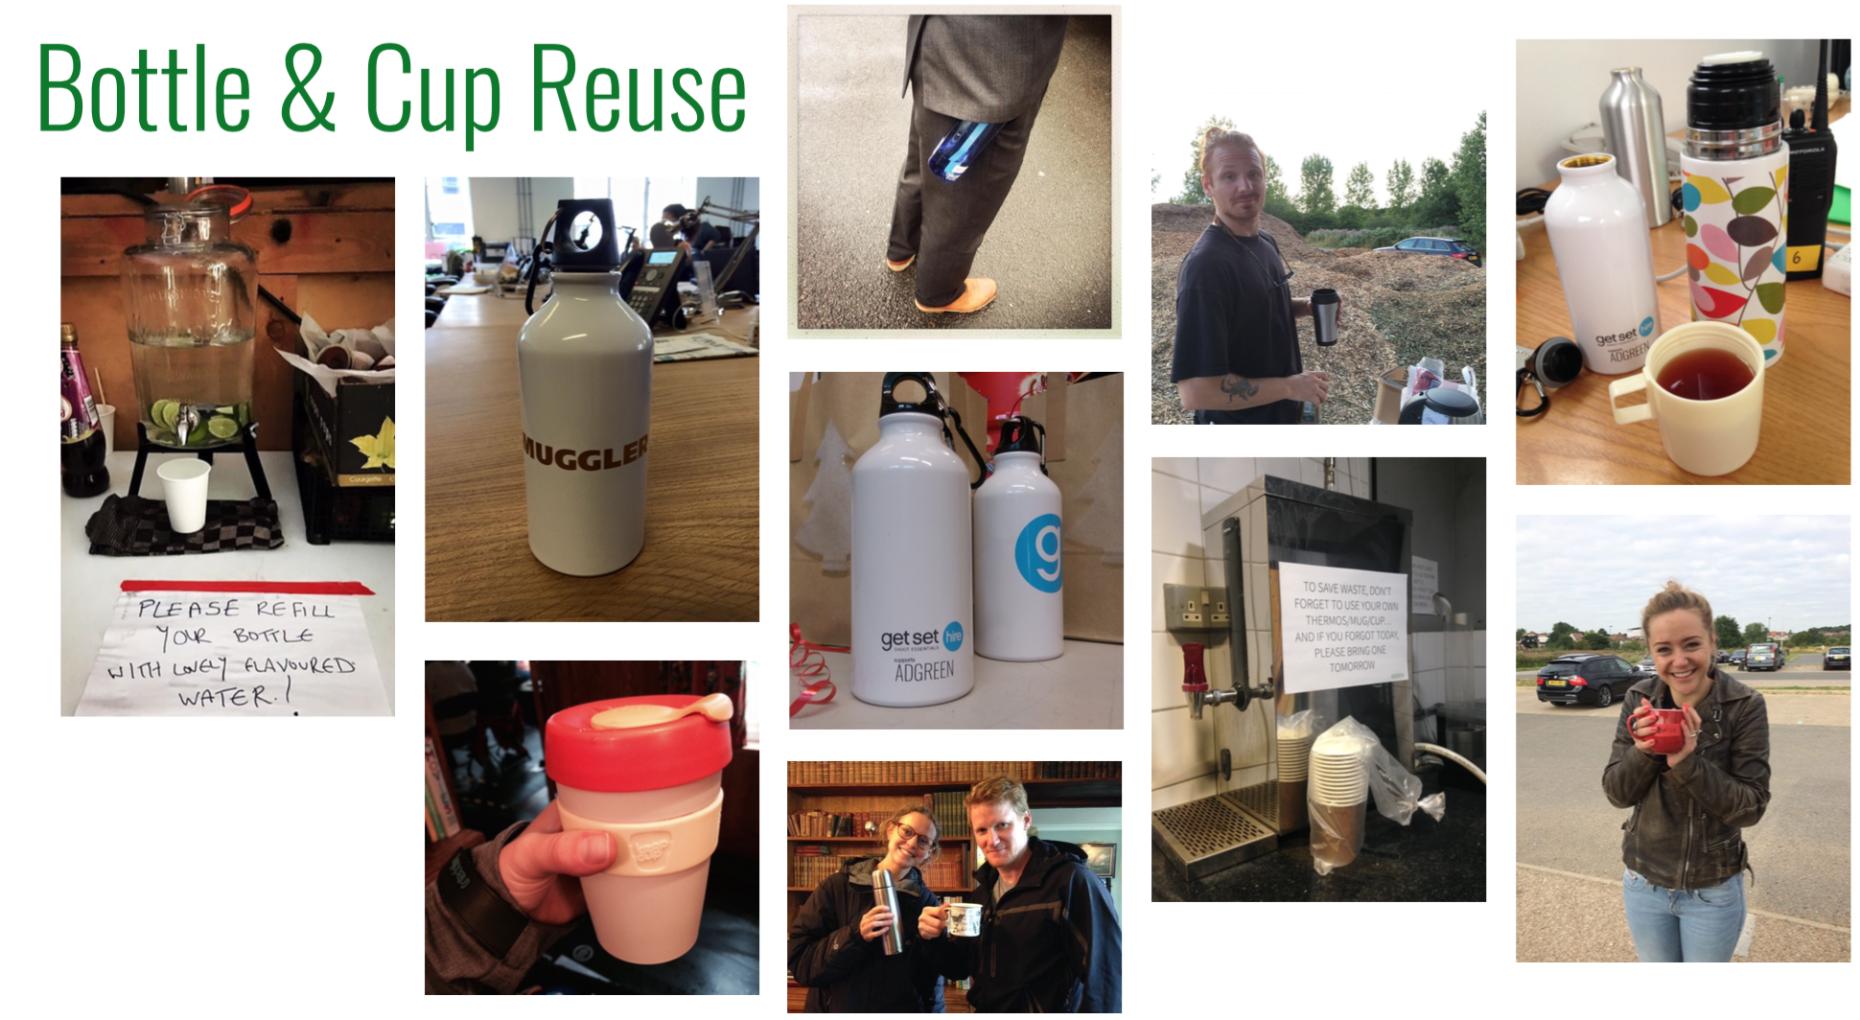 cup & bottle reuse